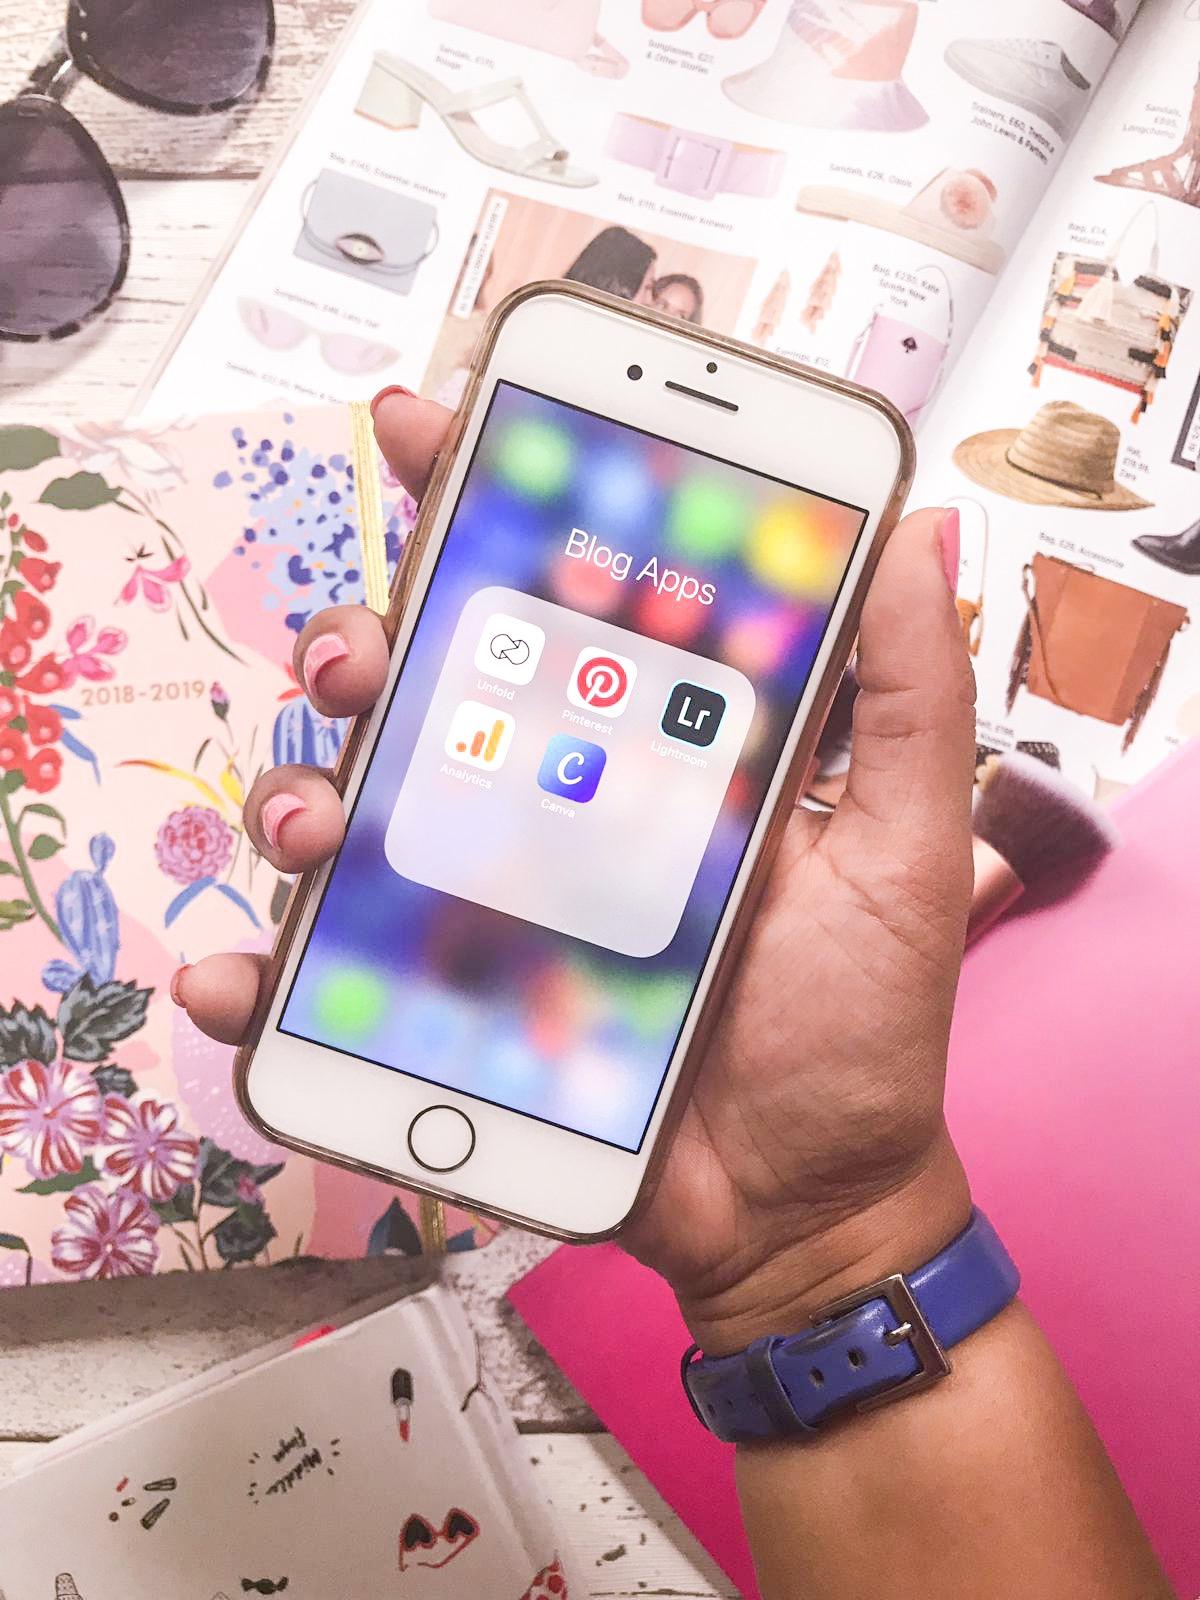 iPhone blog apps flatlay